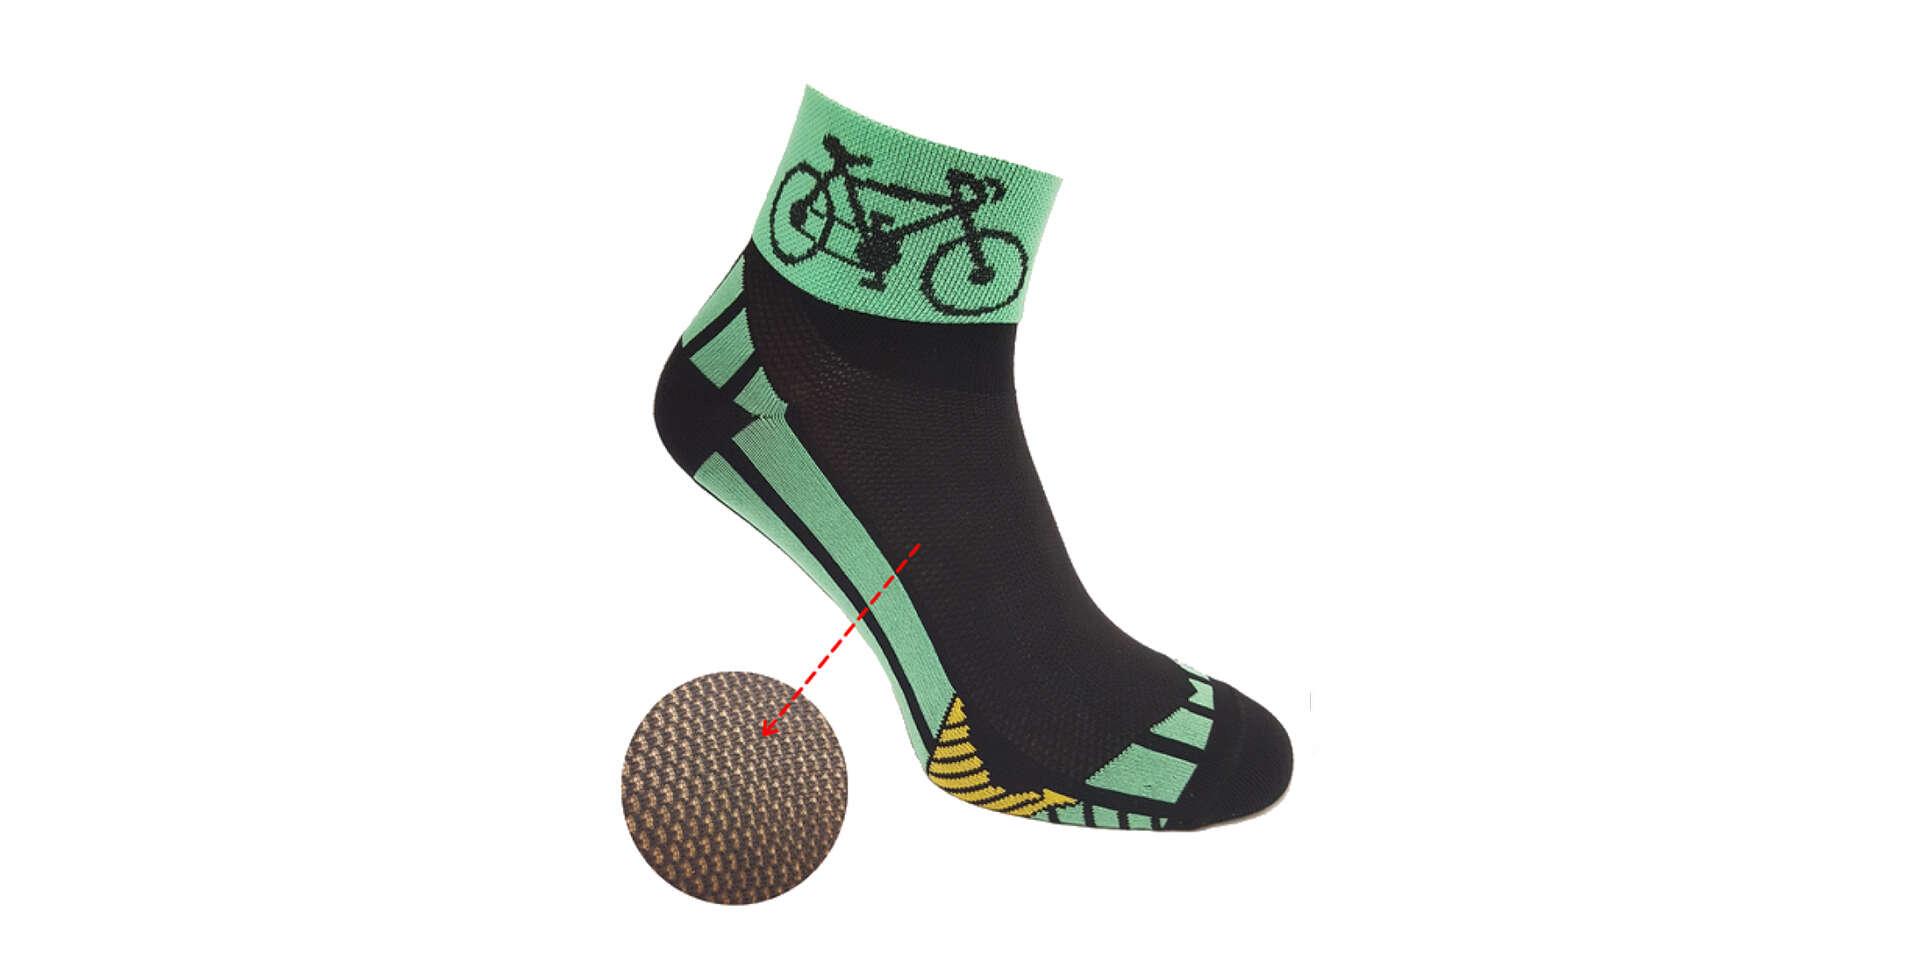 Športové cyklo ponožky alebo krátke hladké ponožky značky Foxy...